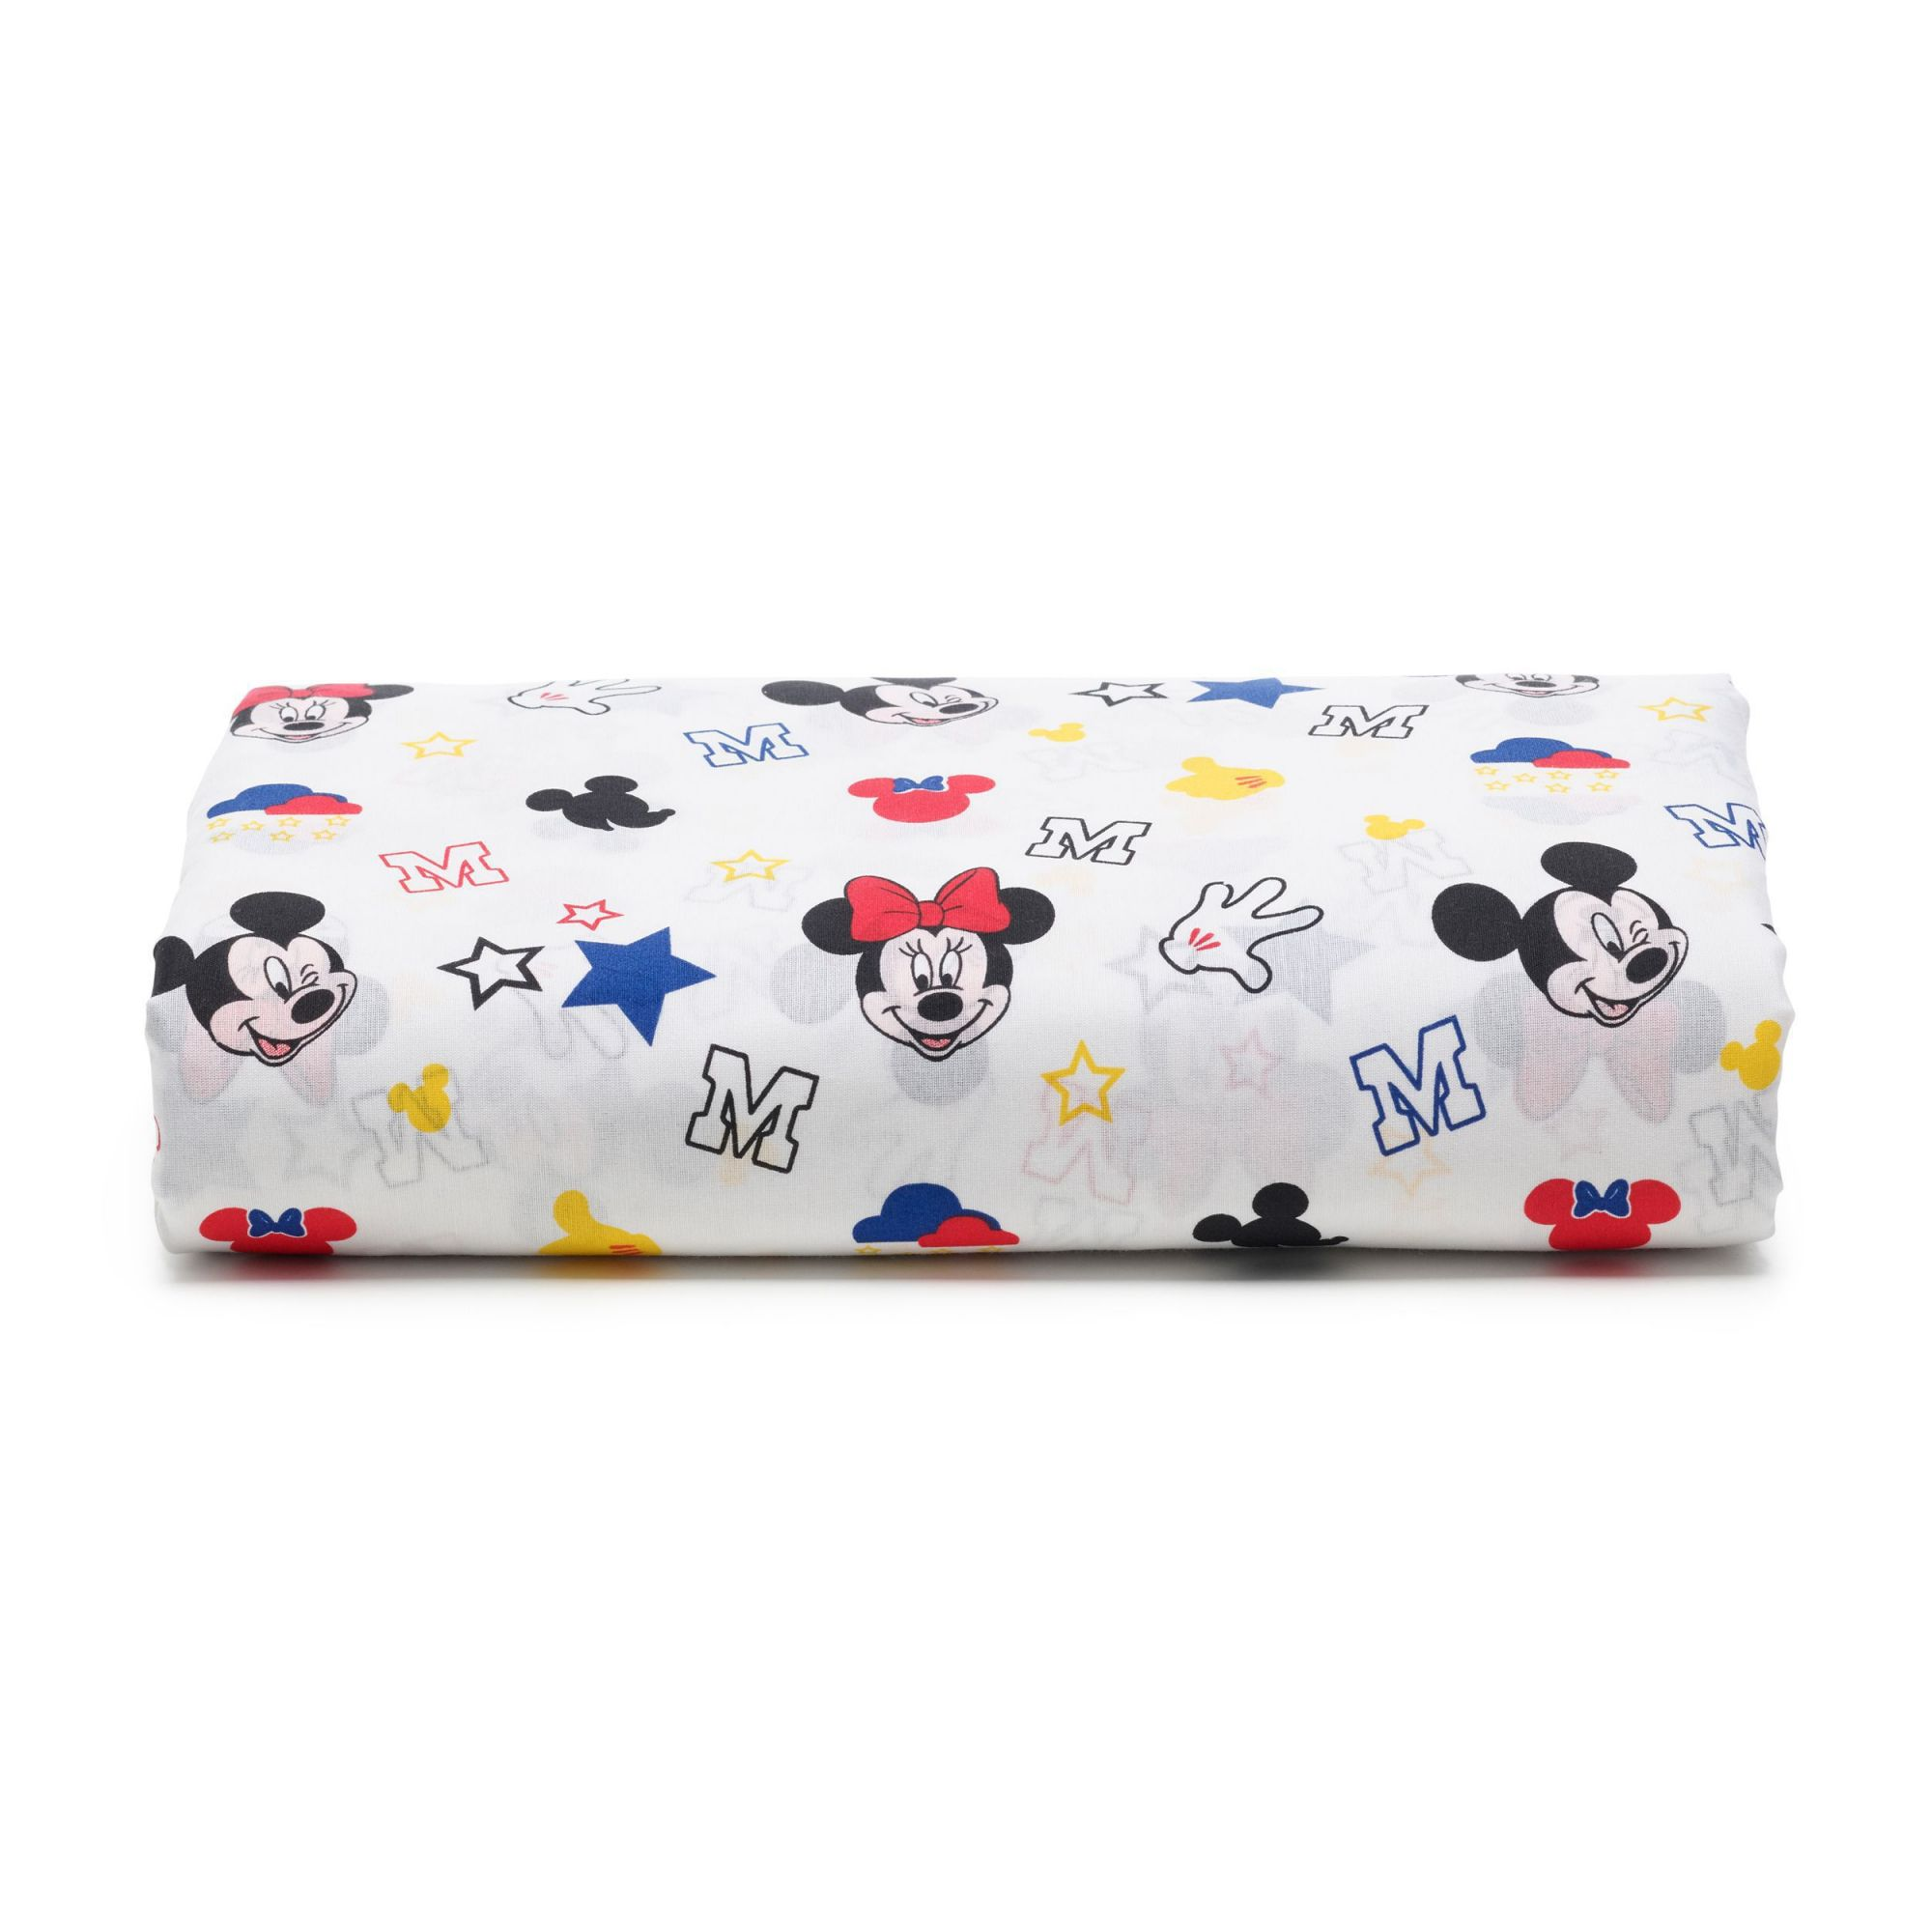 Jogo De Cama Infantil Mickey Stick 2 Peças Santista